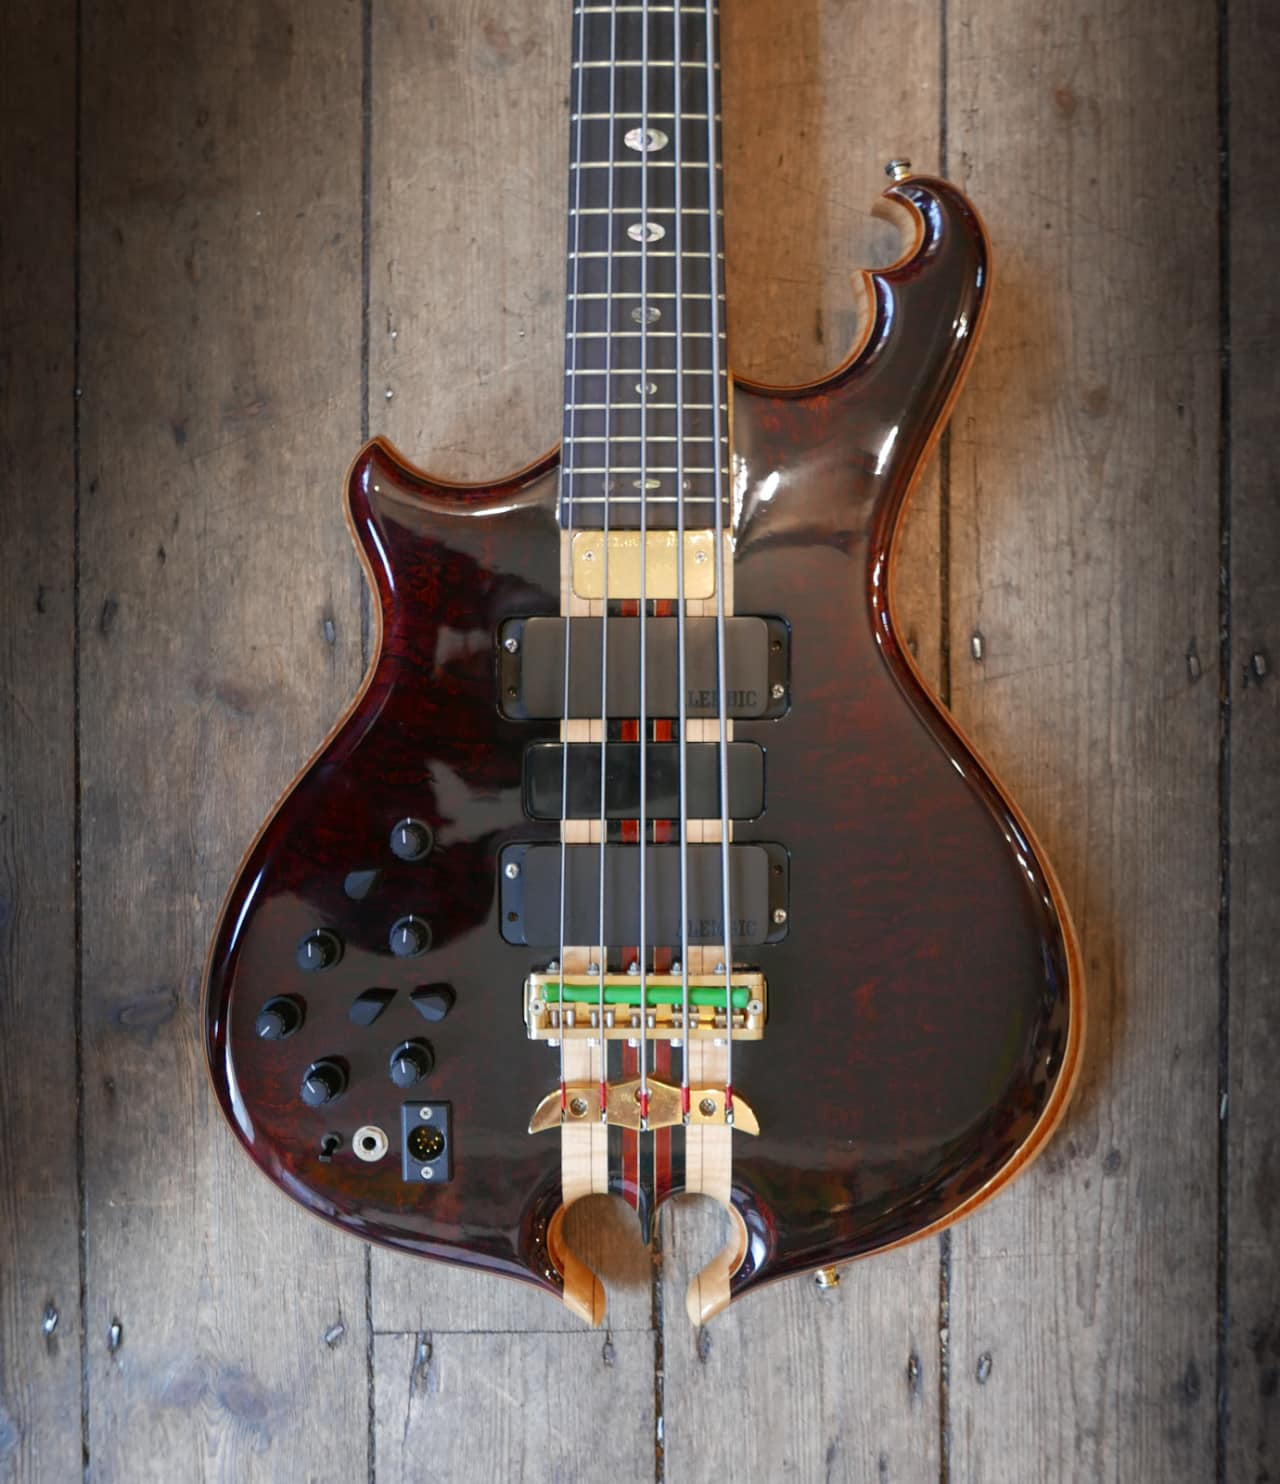 alembic omega cut 5 string bass 1990 39 s natural reverb. Black Bedroom Furniture Sets. Home Design Ideas